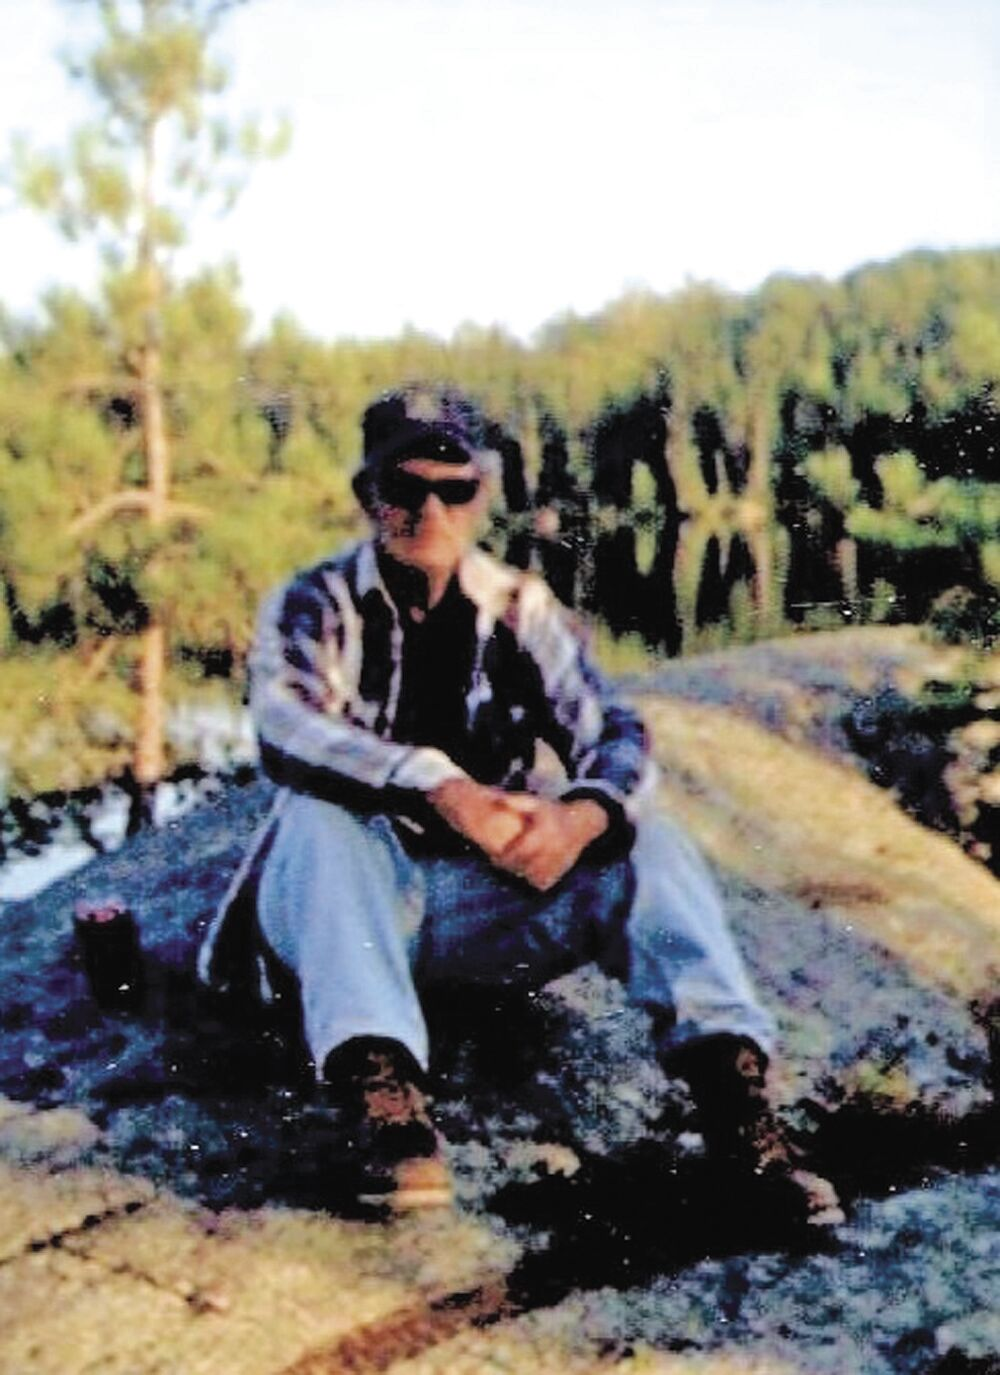 Vietnam veteran David Anderson never gave up